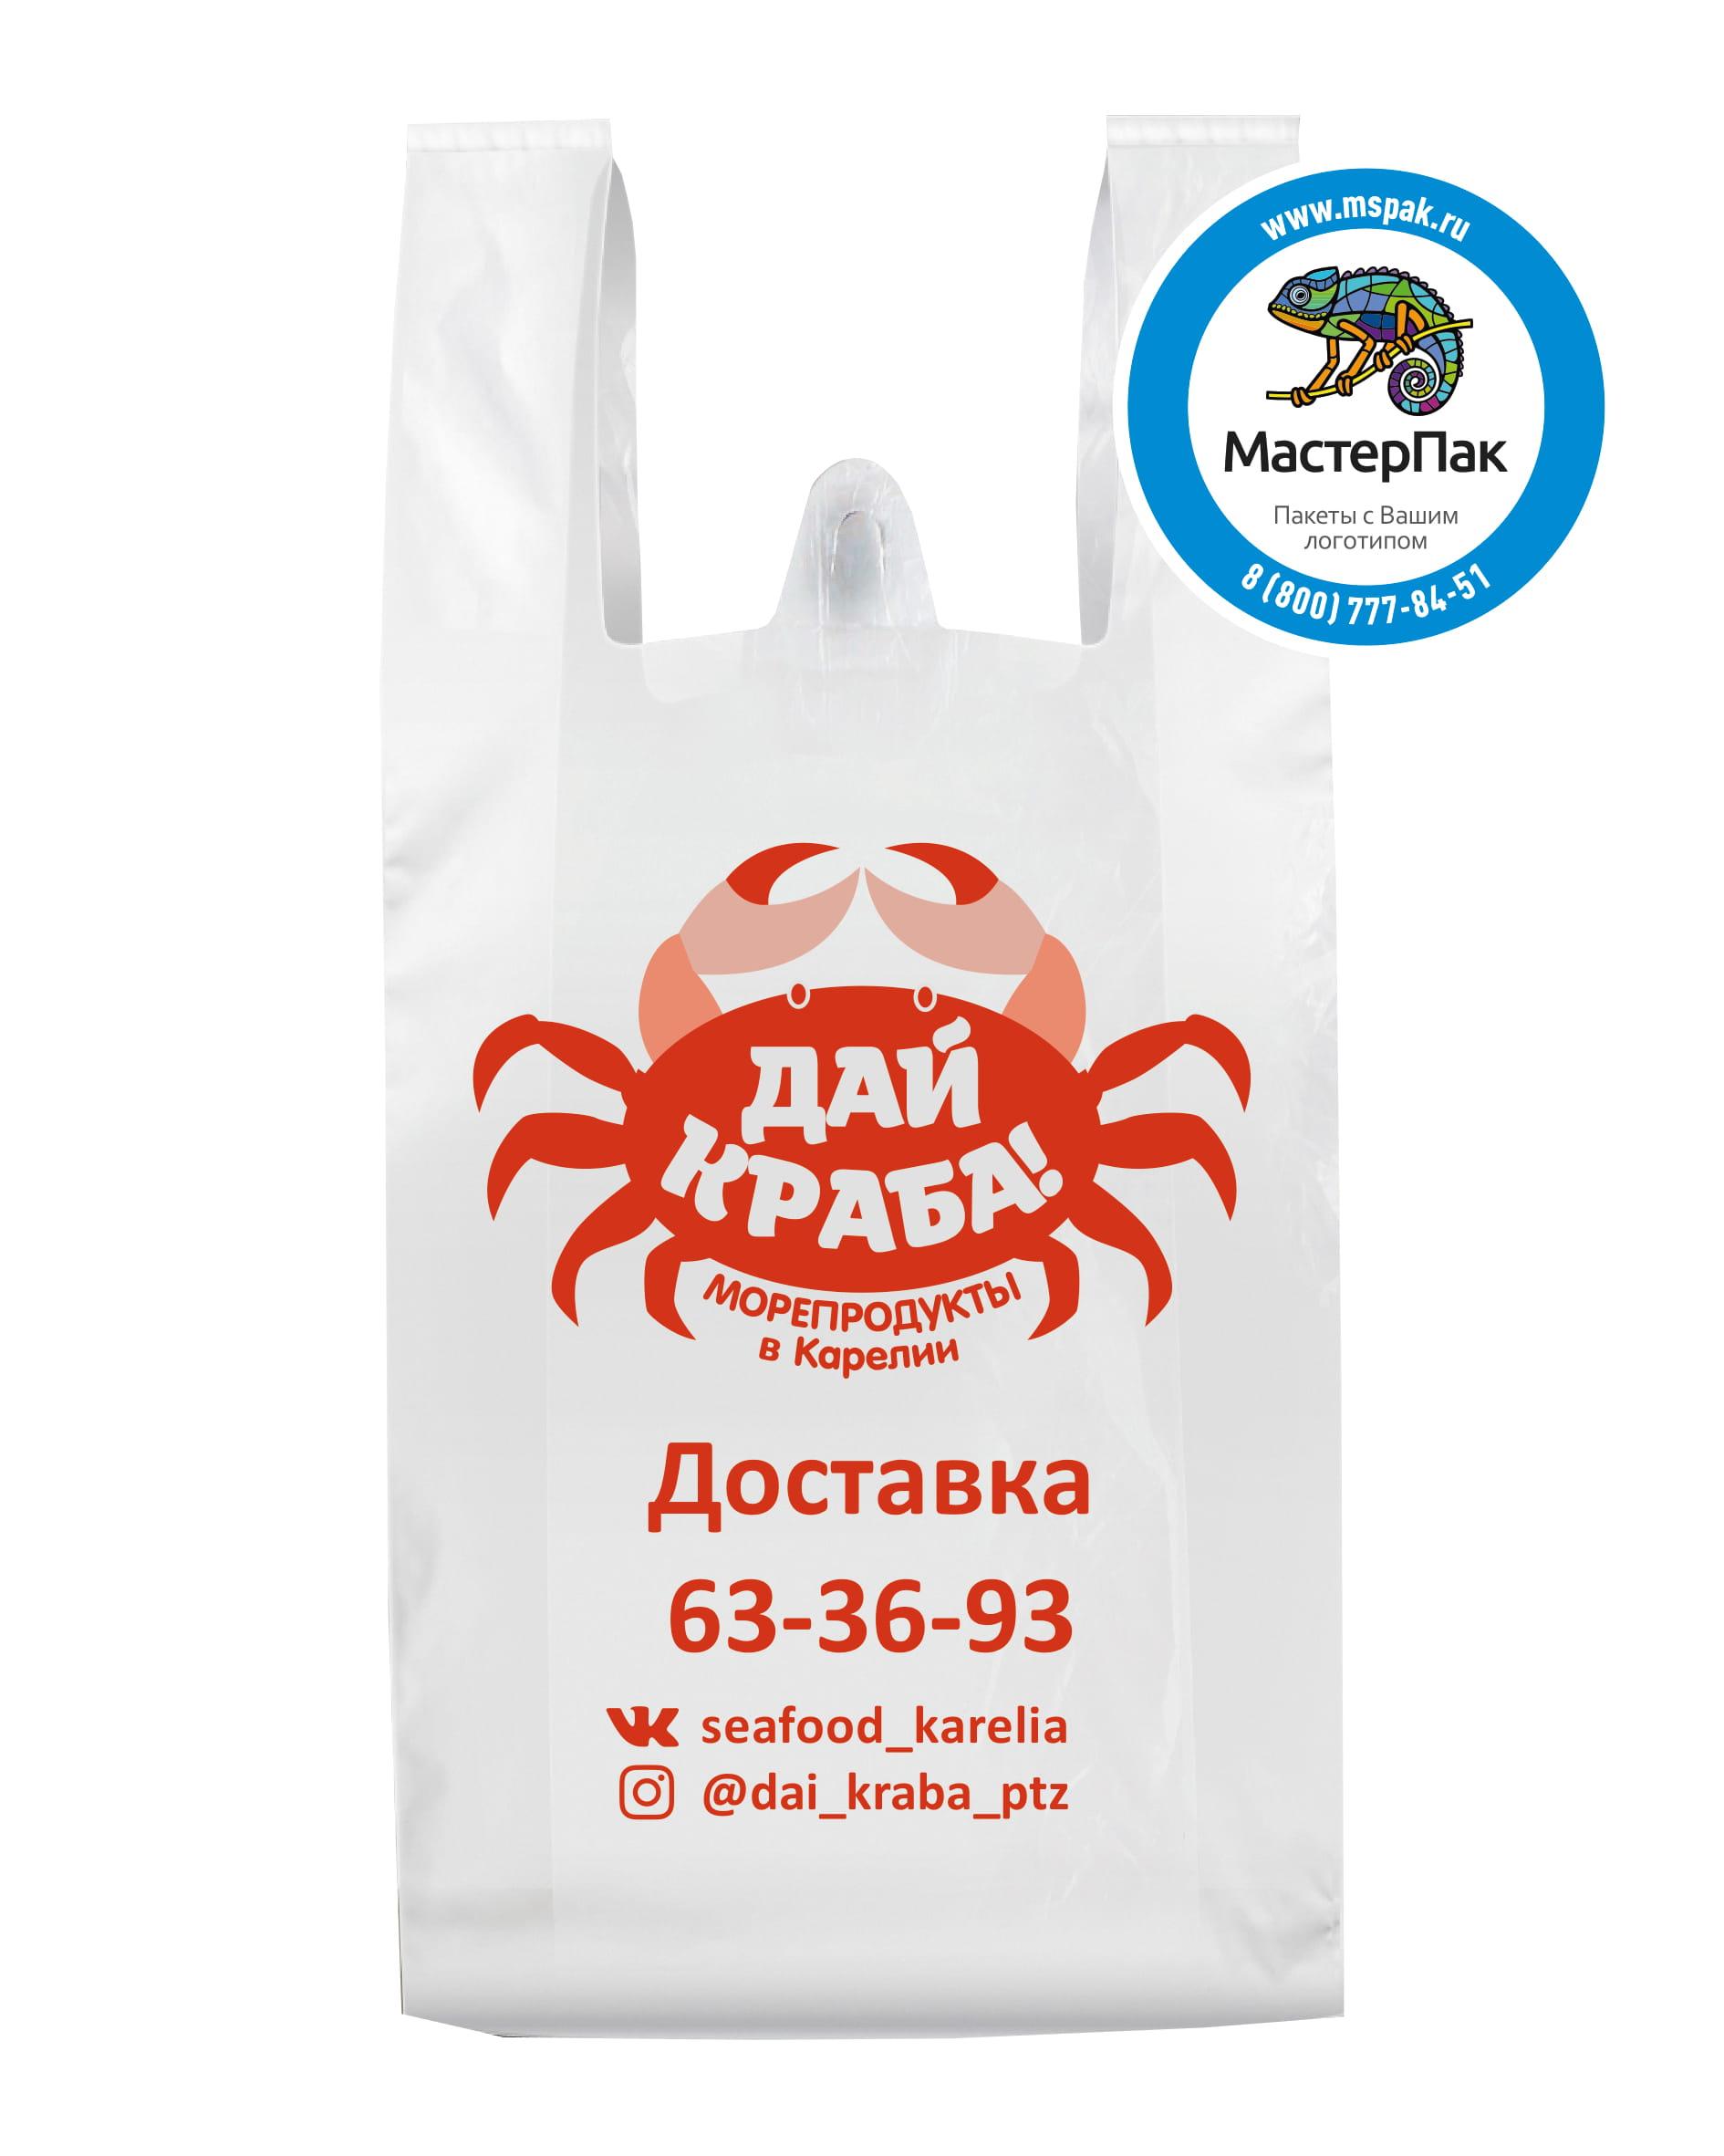 Пакет майка с ПНД, 25 мкм, с тиснением и логотипом в 3 цвета для поставщика морепродуктов Дай краба!